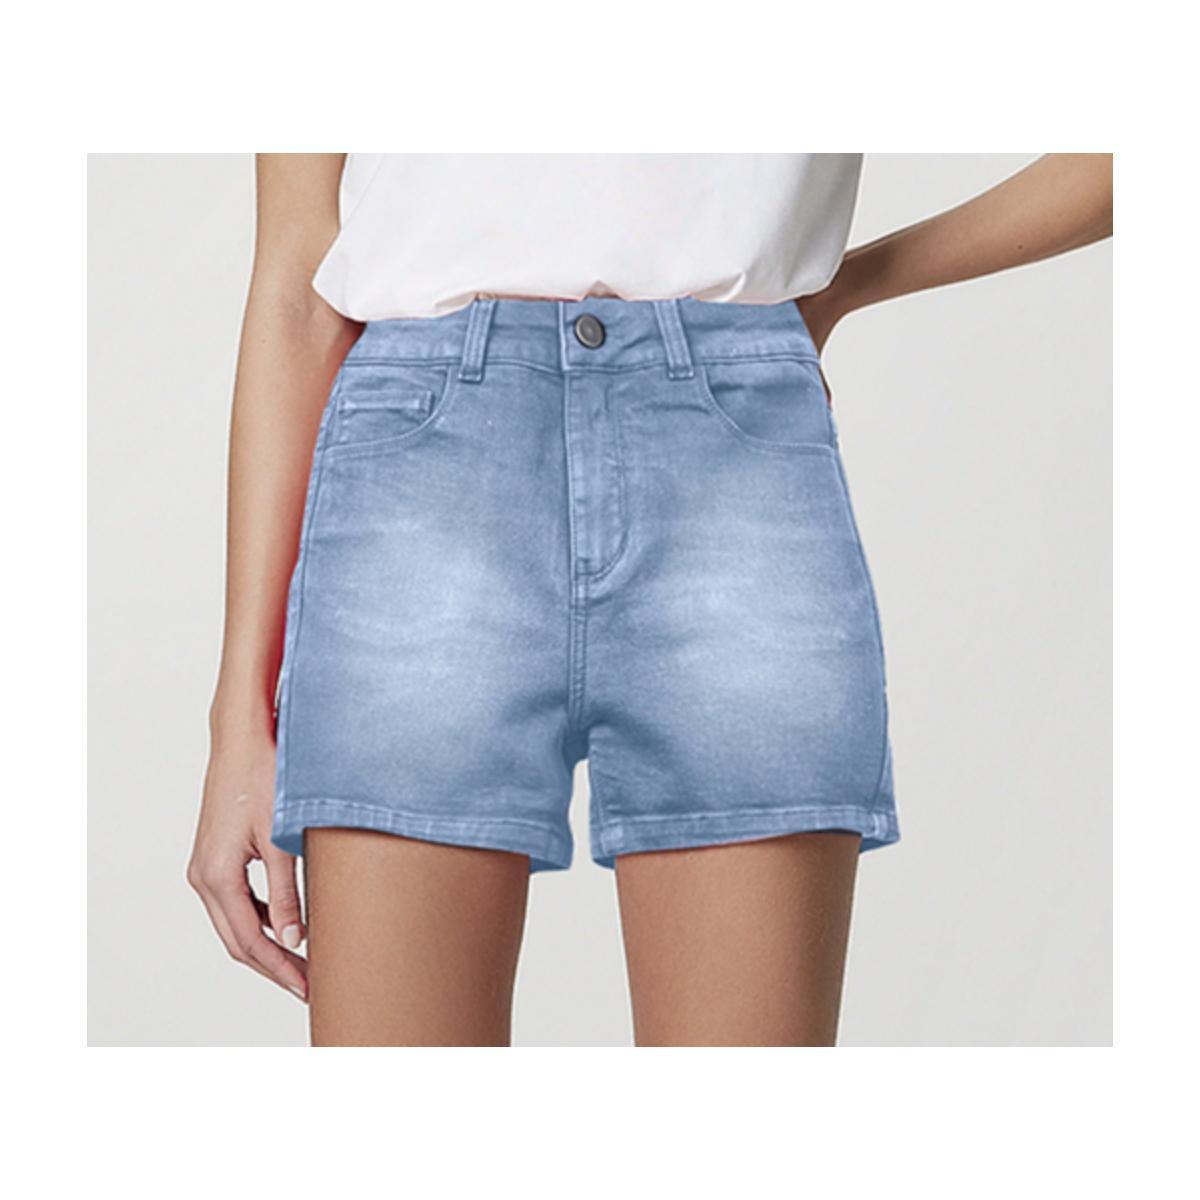 Short Feminino Hering Hb74 1fsn  Jeans Claro